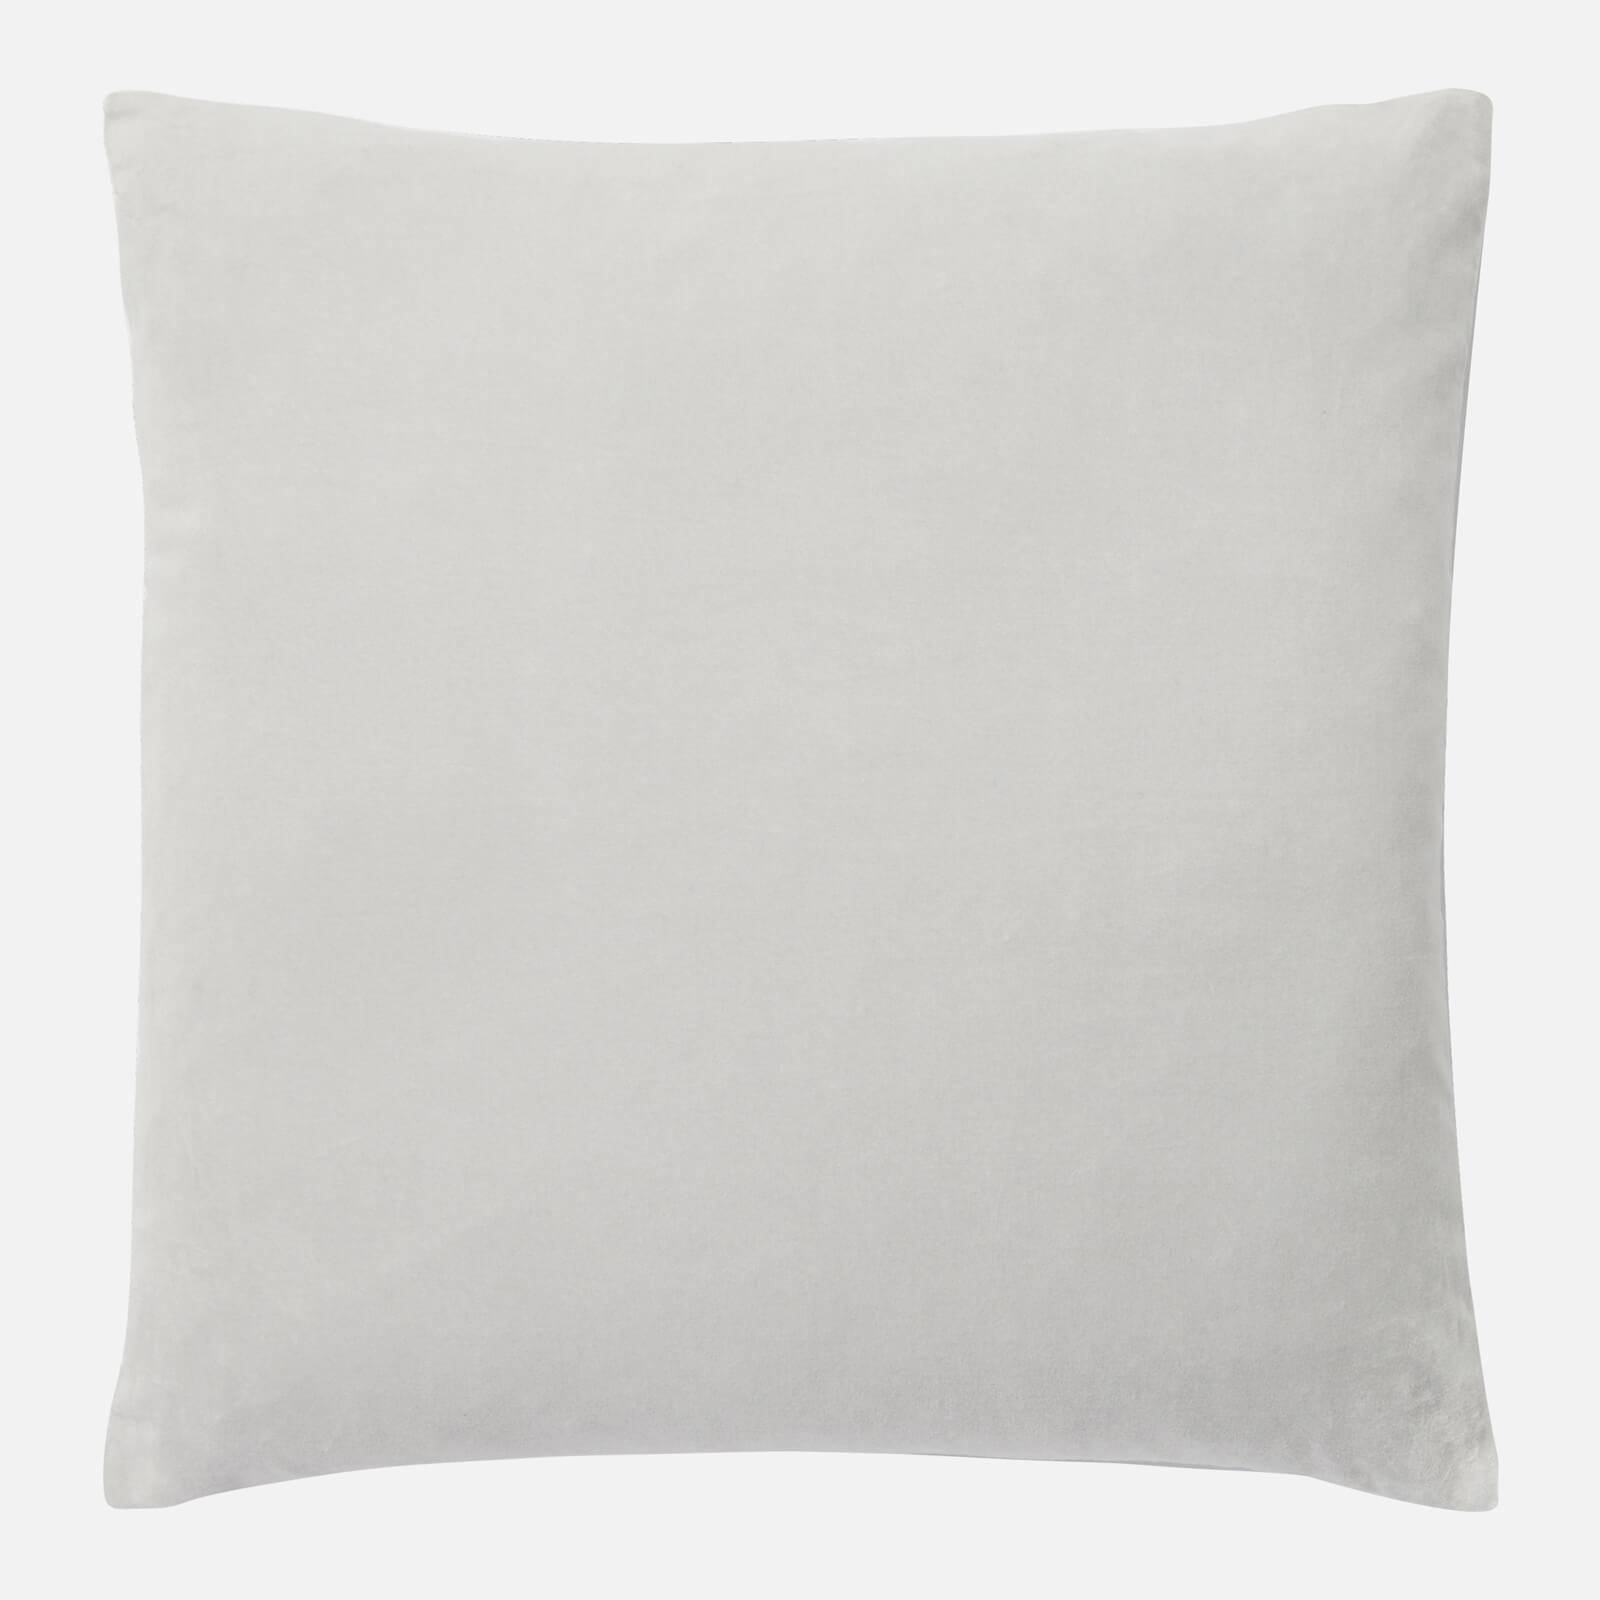 in homeware Cotton Velvet Cushion - Silver